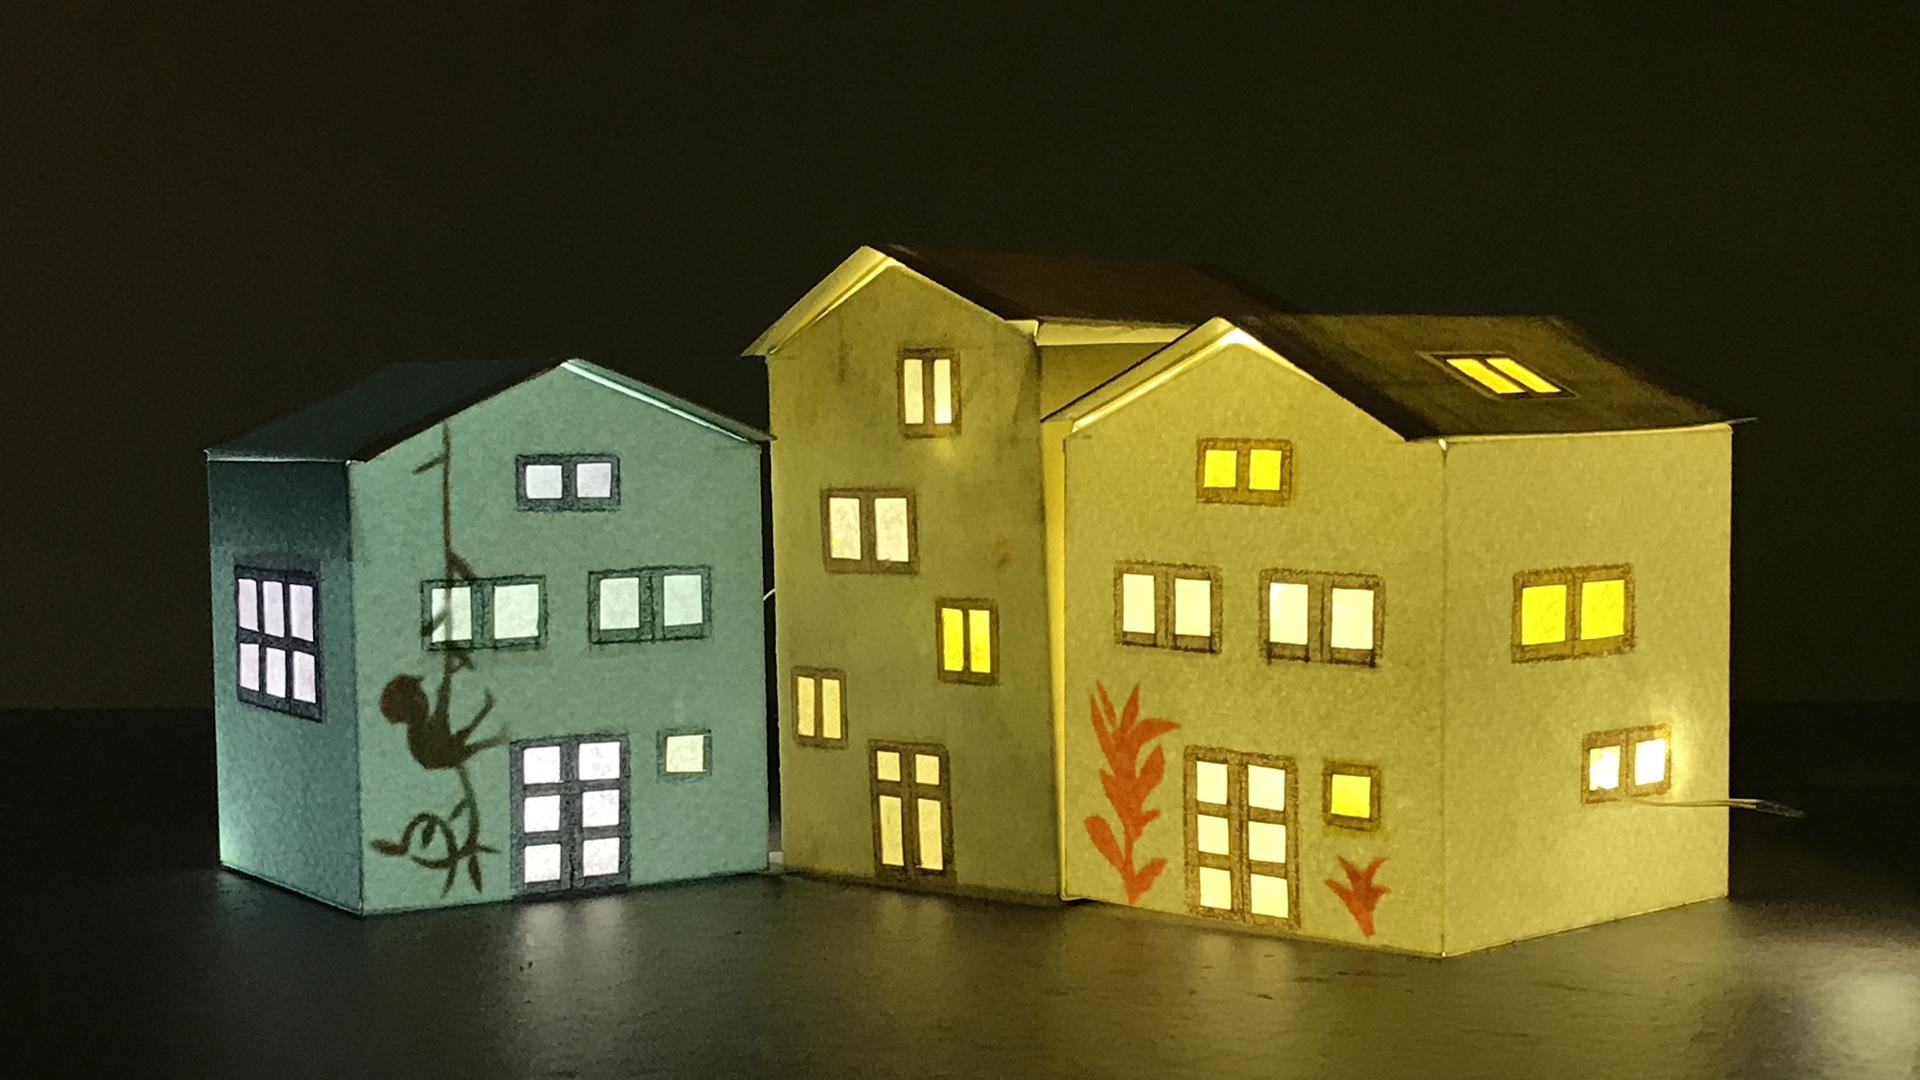 tiny paper houses